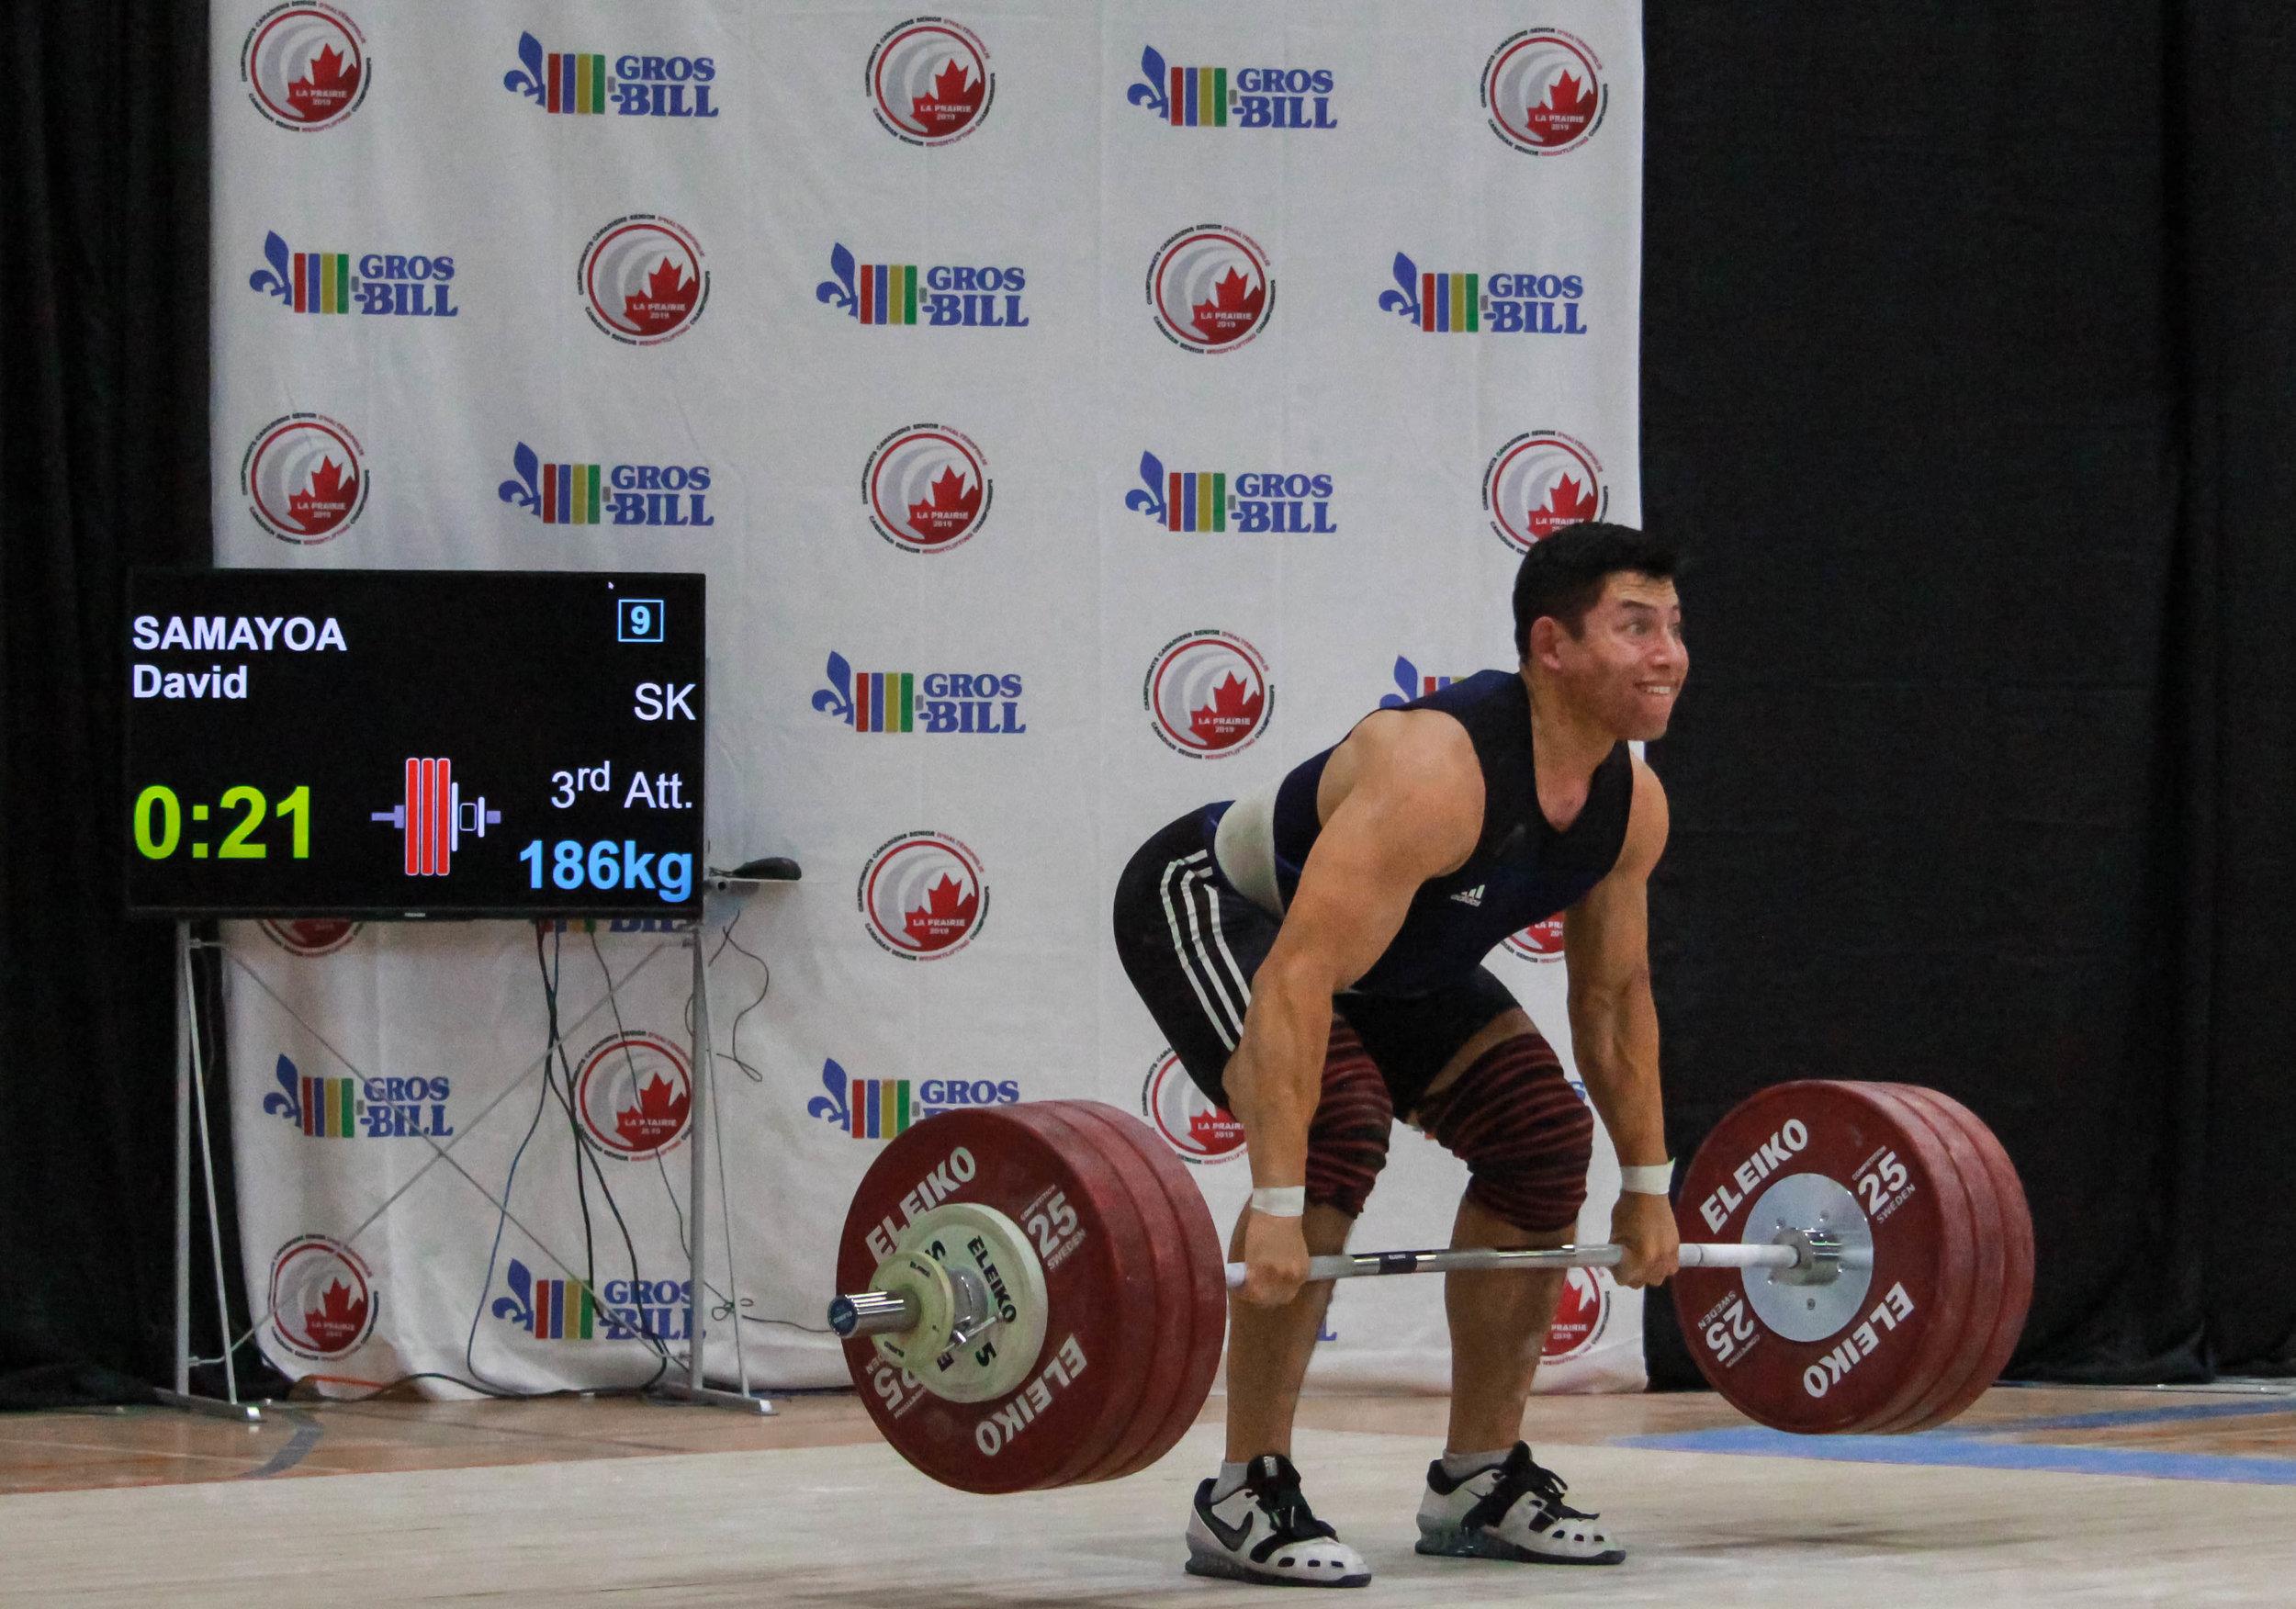 David Samayoa (89kg)